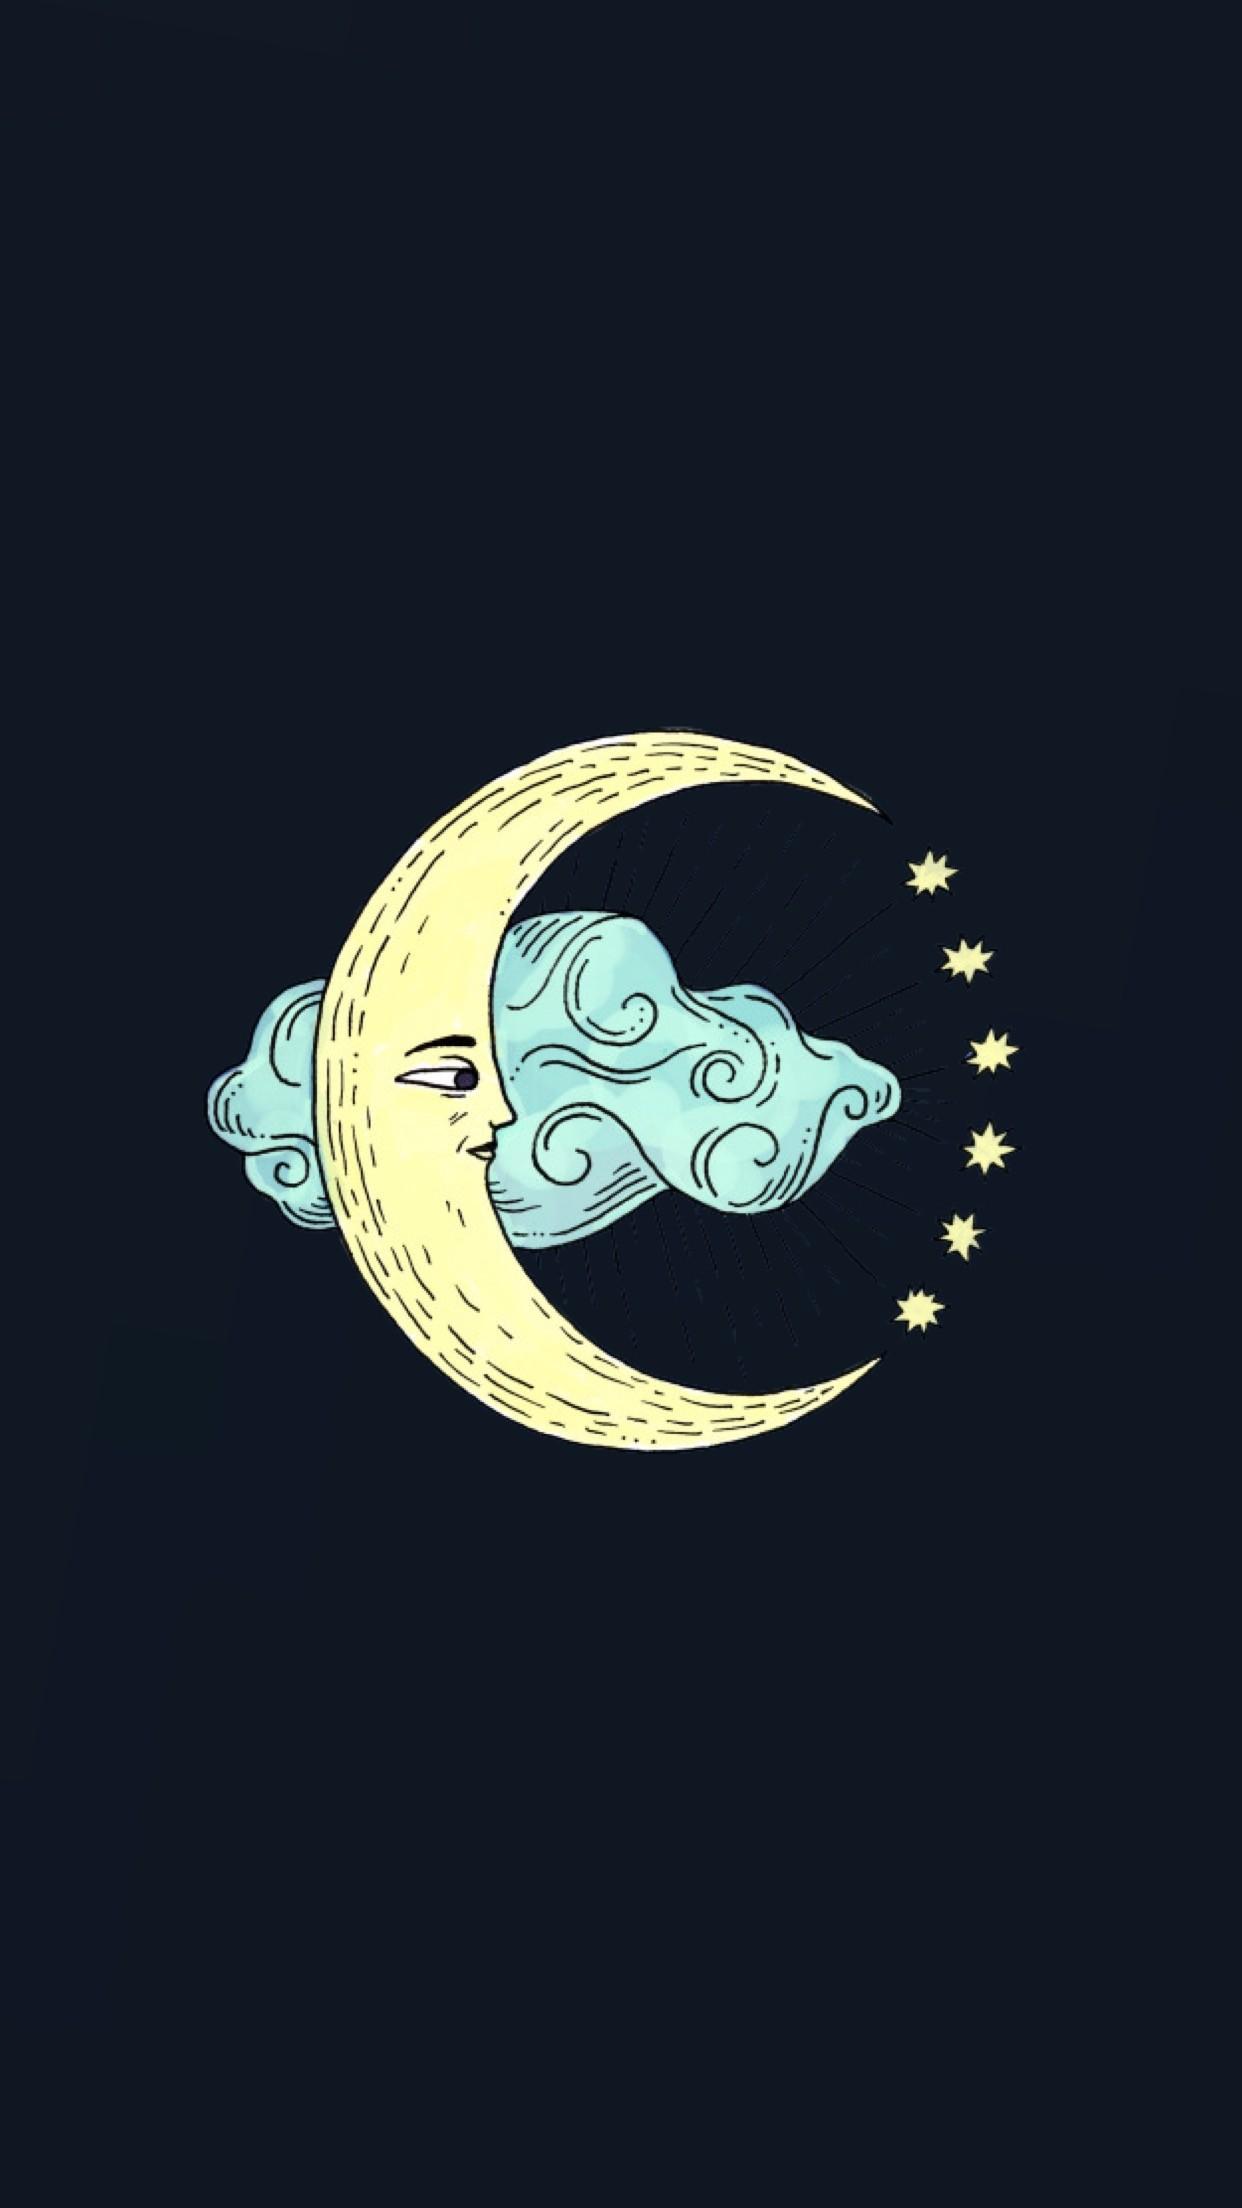 Moon in the clouds wallpaper | made by Laurette | instagram:@laurette_evonen